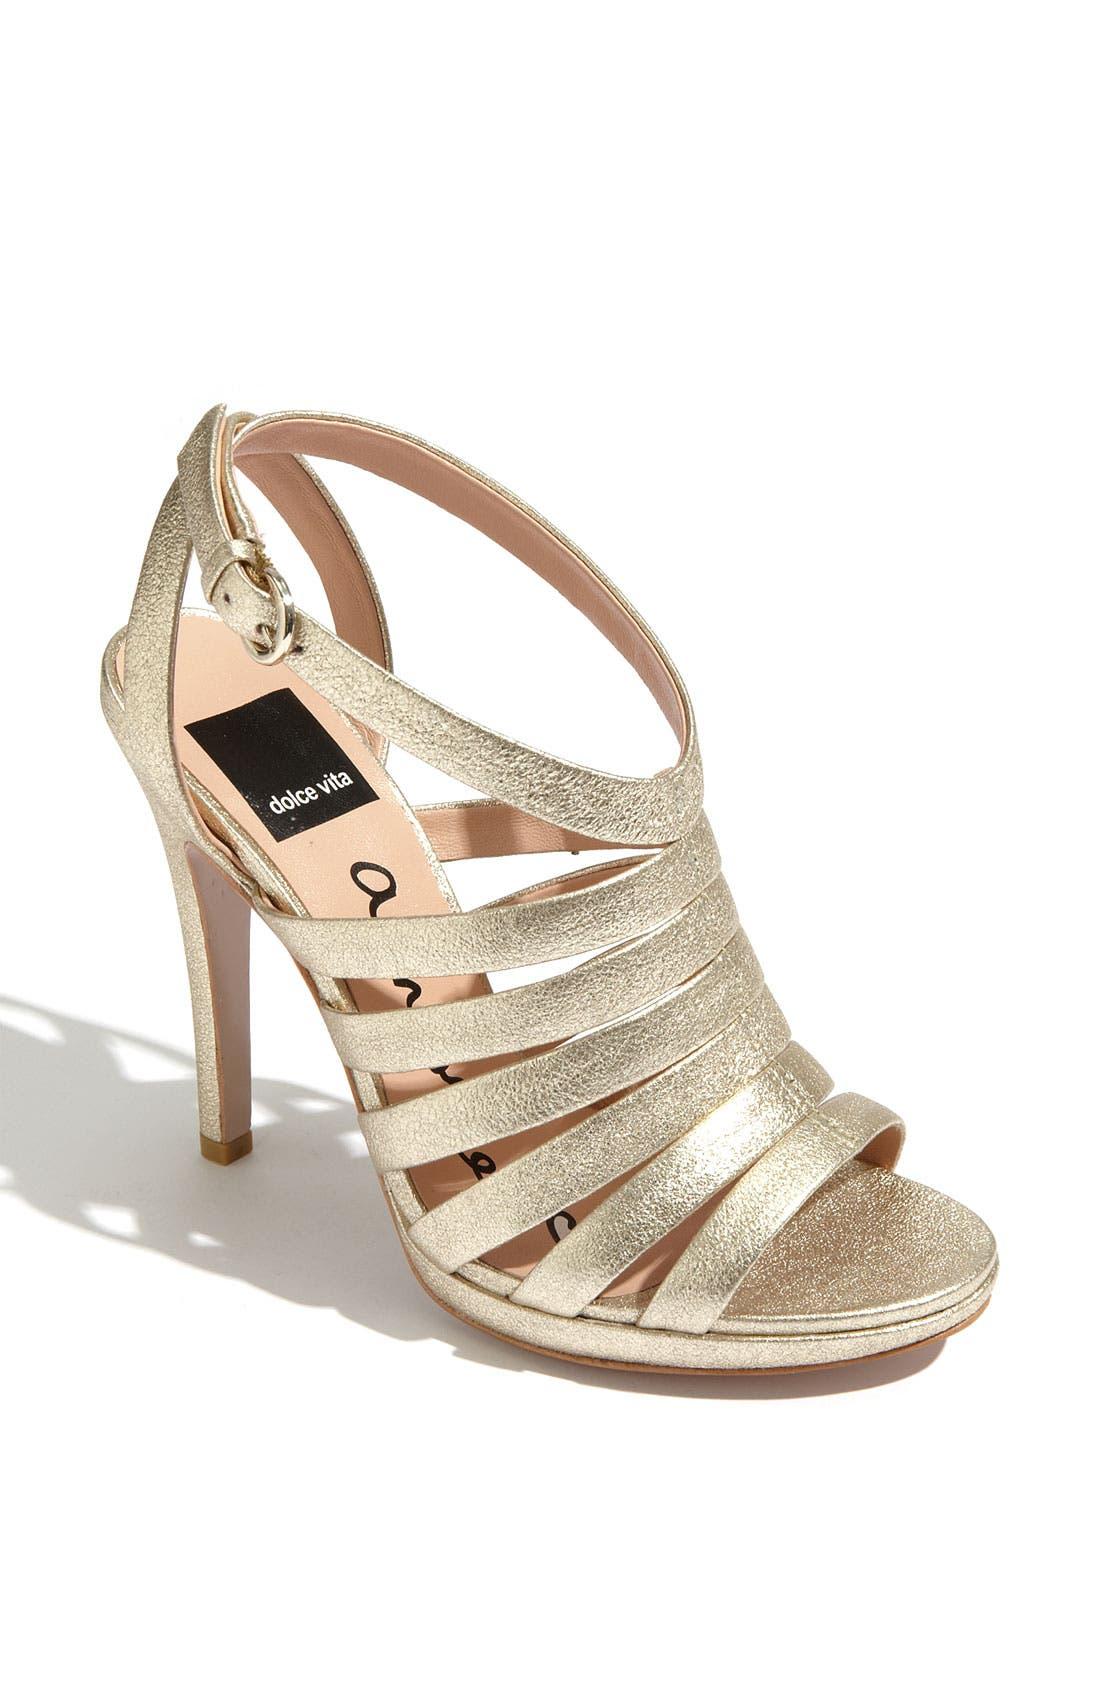 Main Image - Dolce Vita 'Riso' Sandal